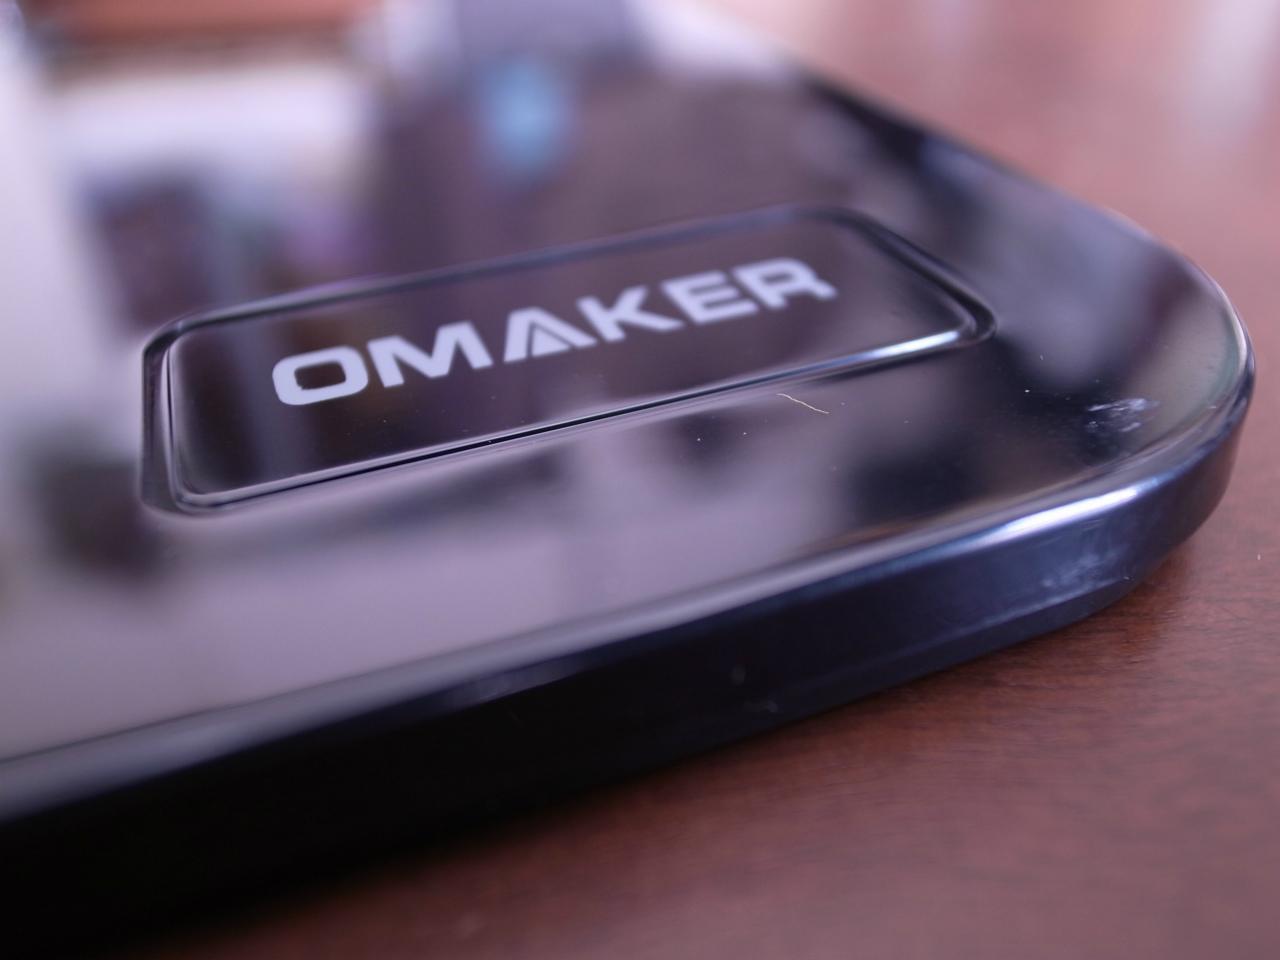 1201-201603_Omaker LED Desklight 03